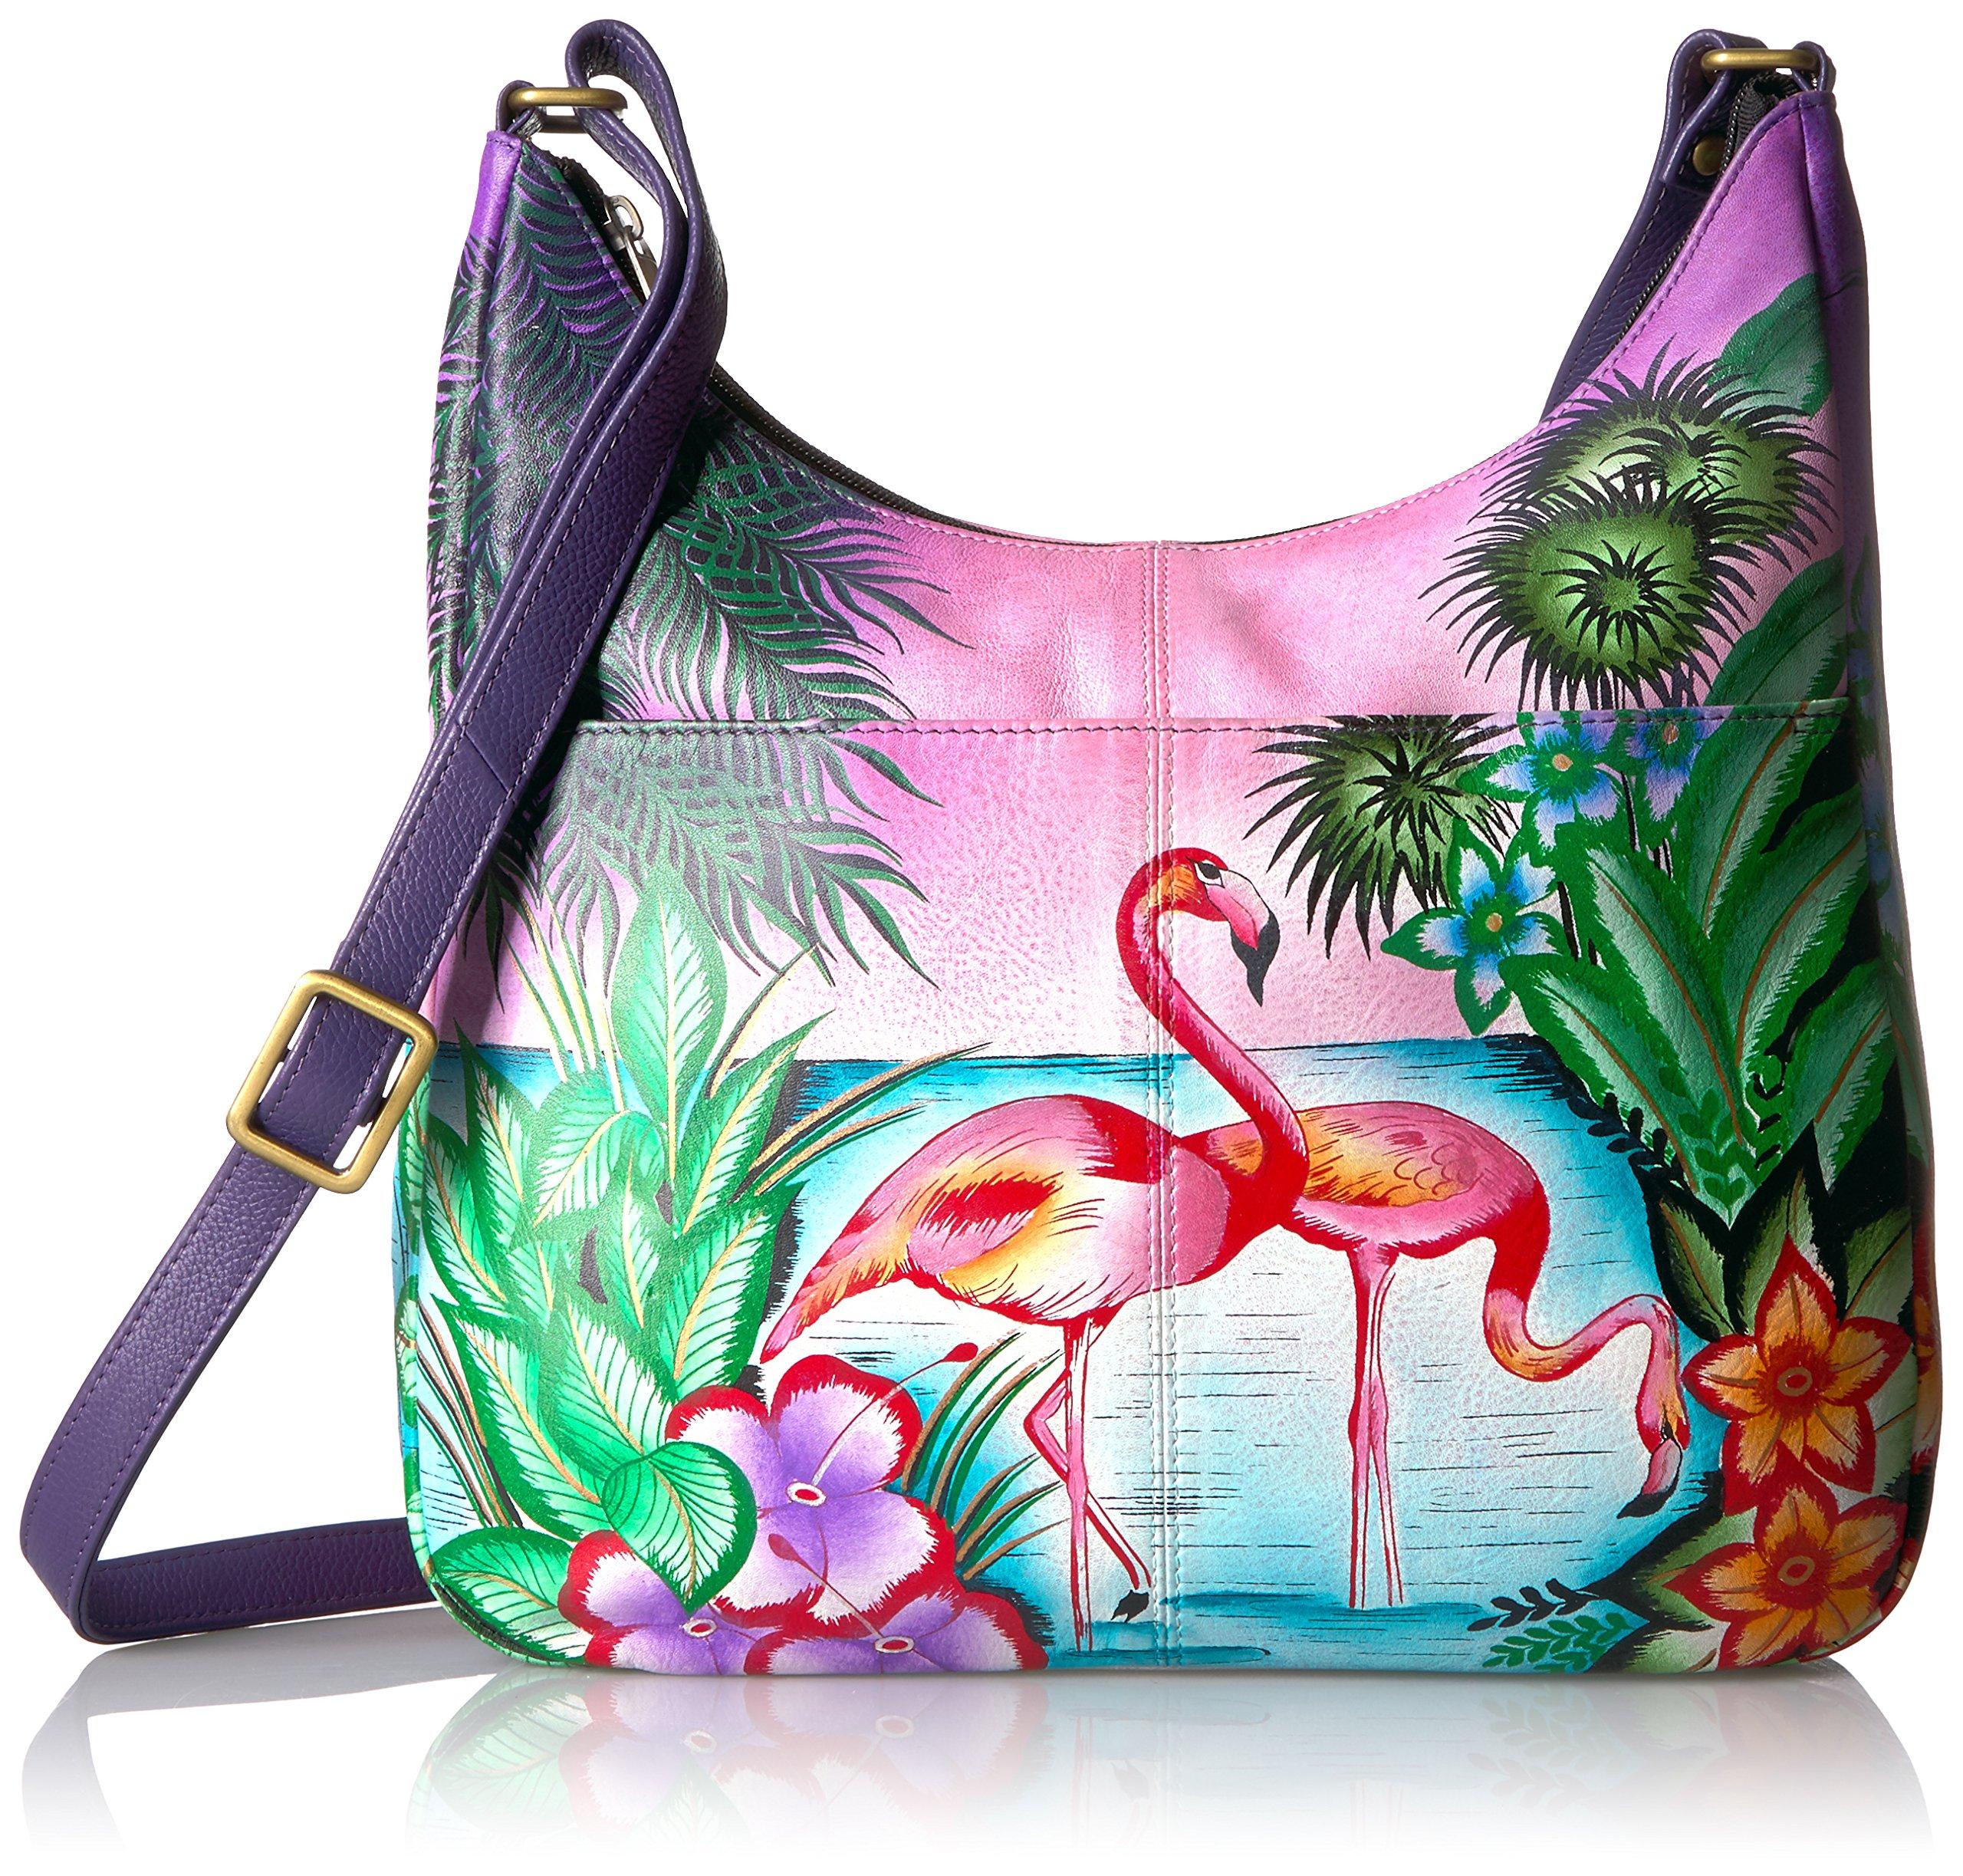 Anuschka Anna Handpainted Leather Medium Shopper Bag-Tropical Flamingo